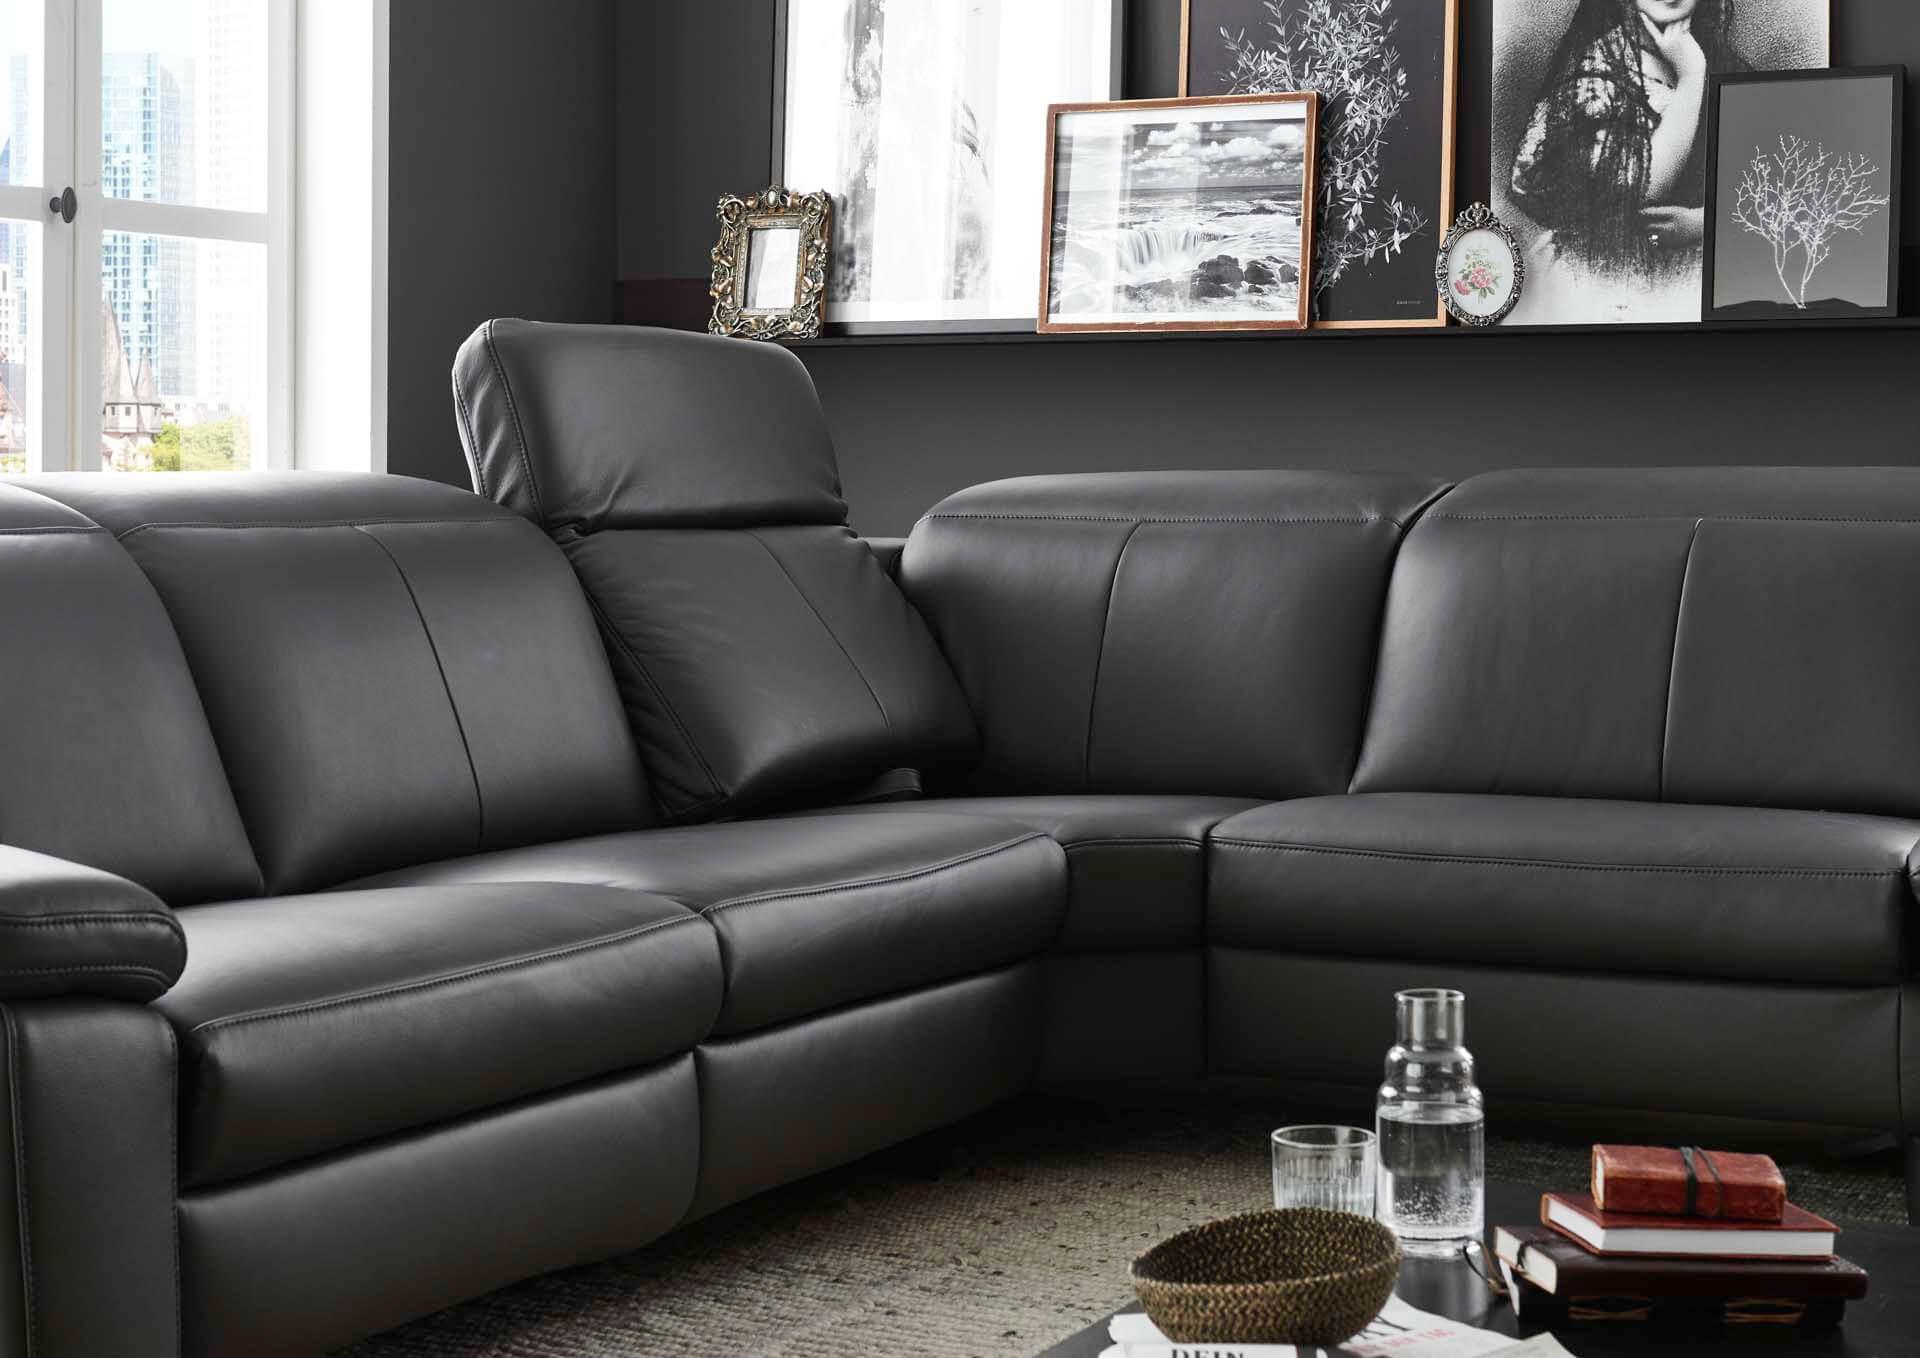 Sofa-Harlem-Com4Lux8